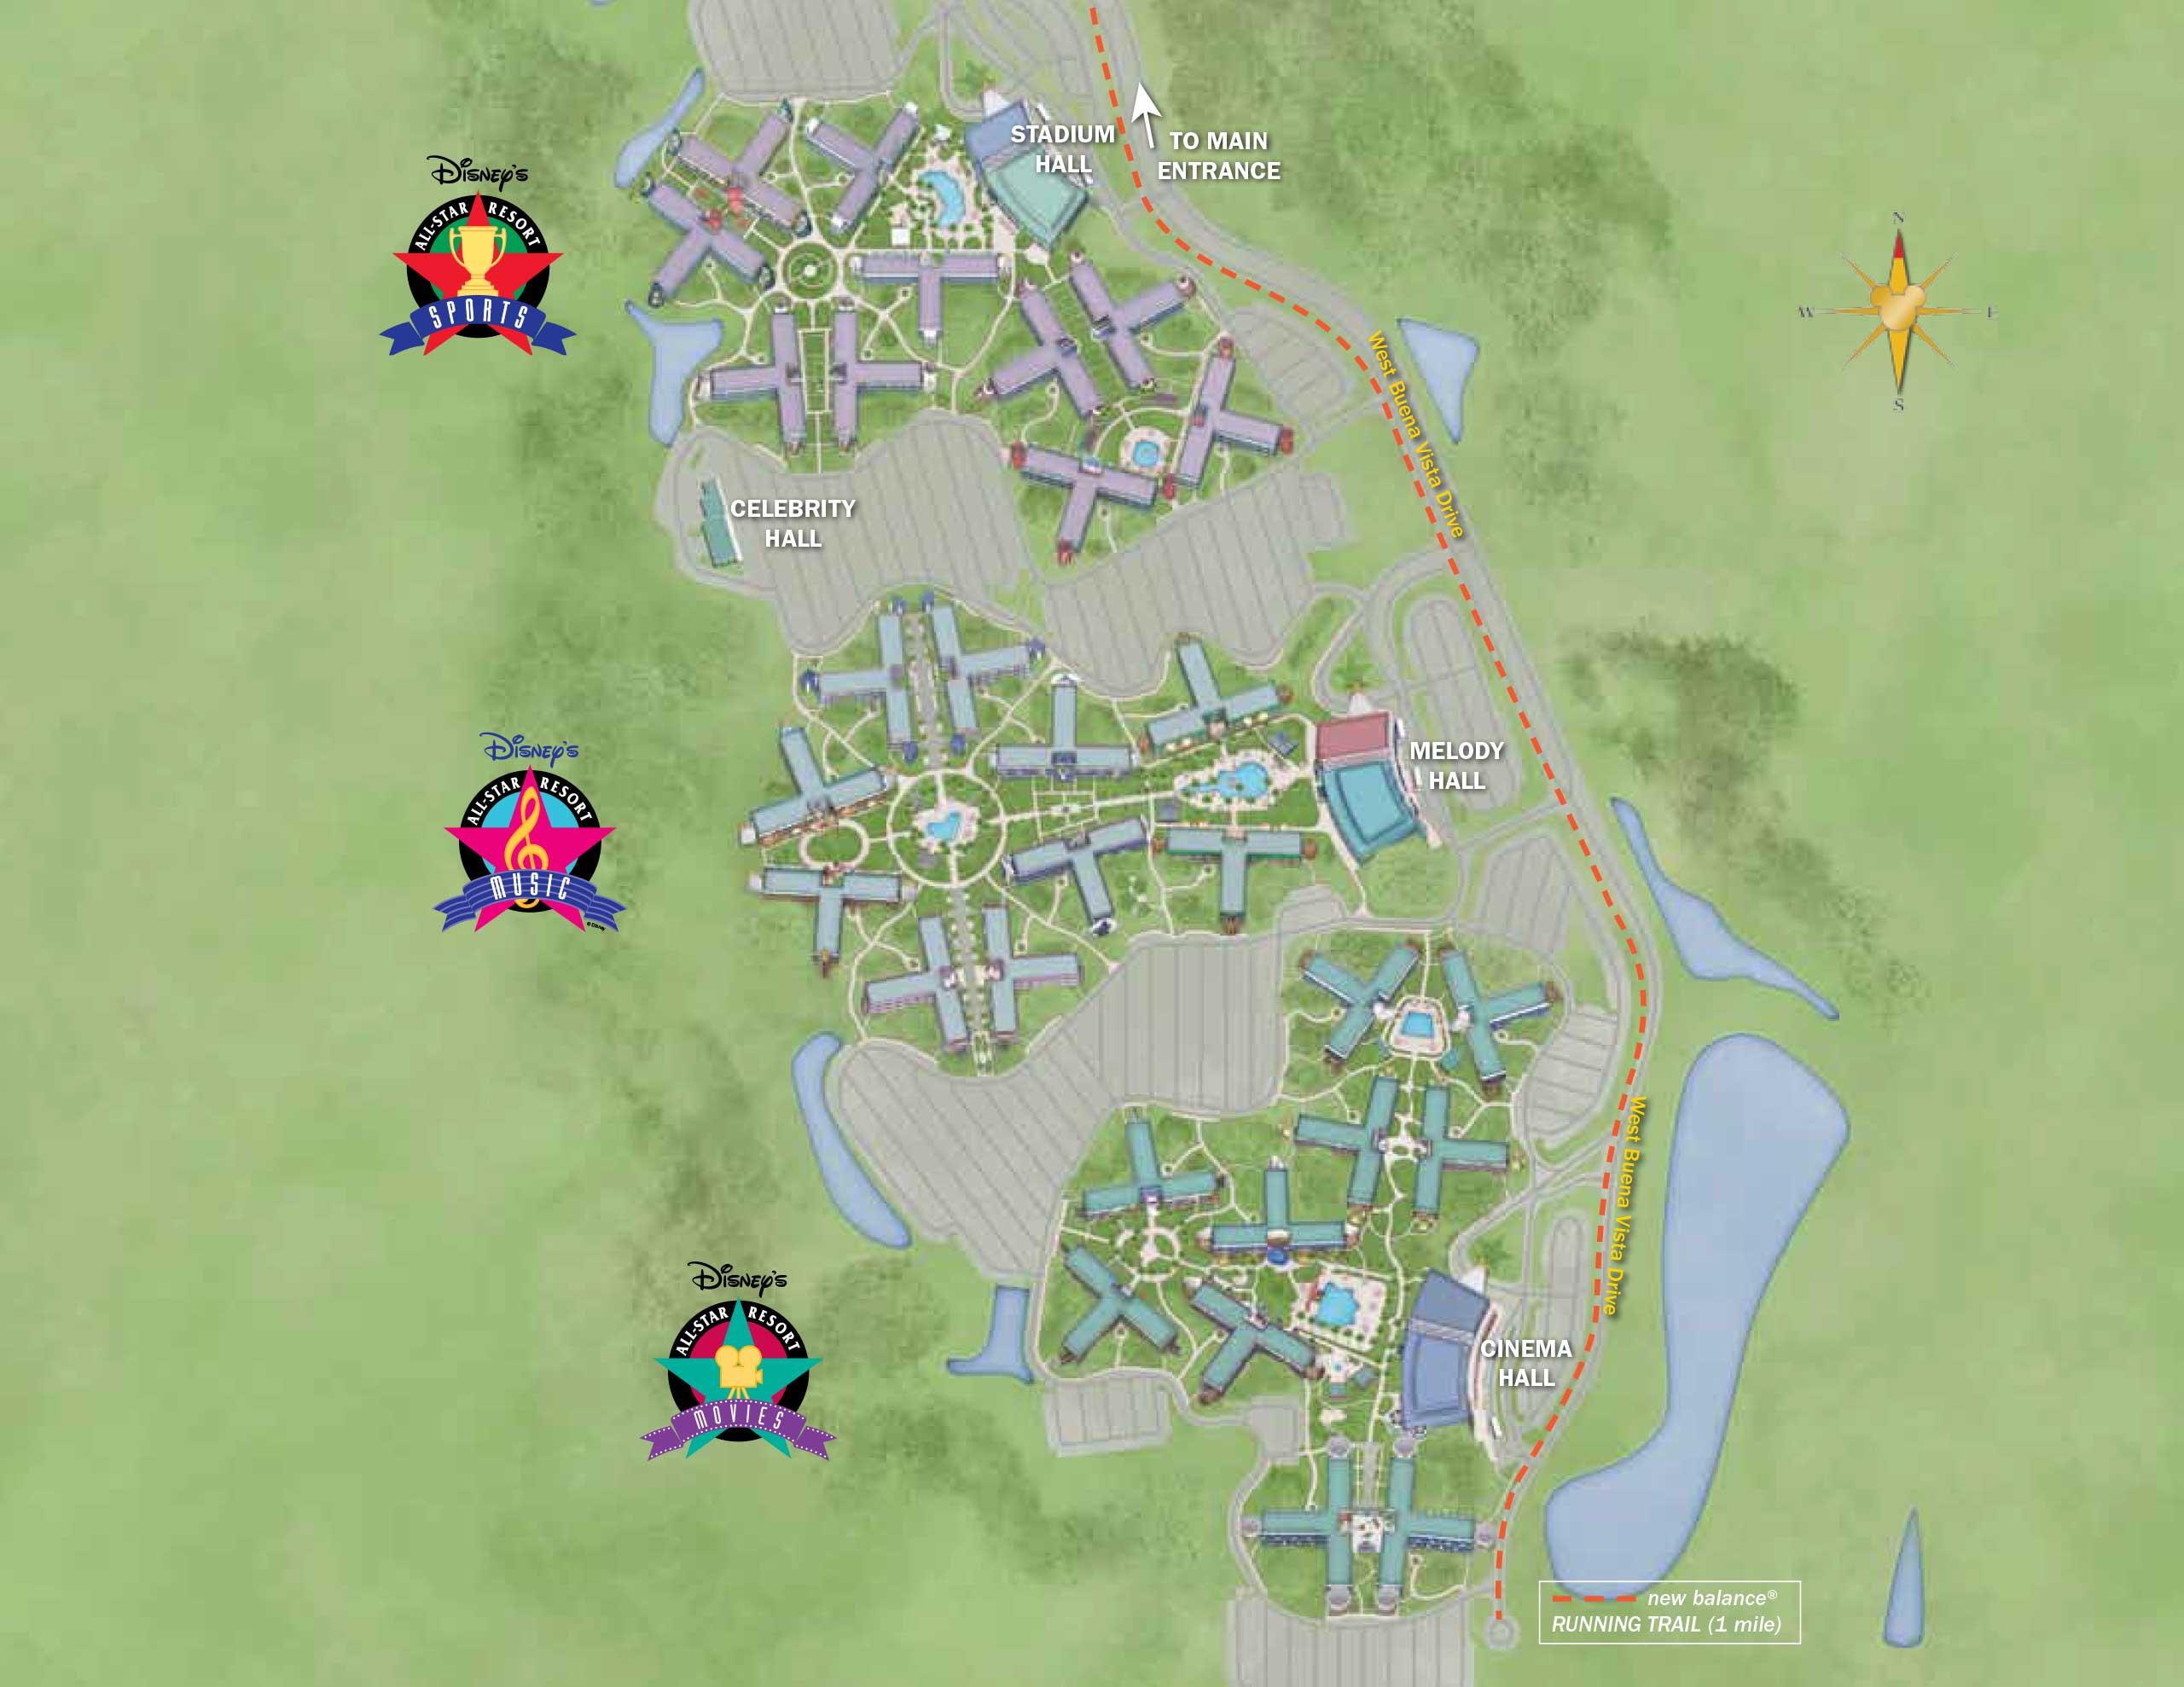 April 2017 Walt Disney World Resort Hotel Maps - Photo 1 of 33